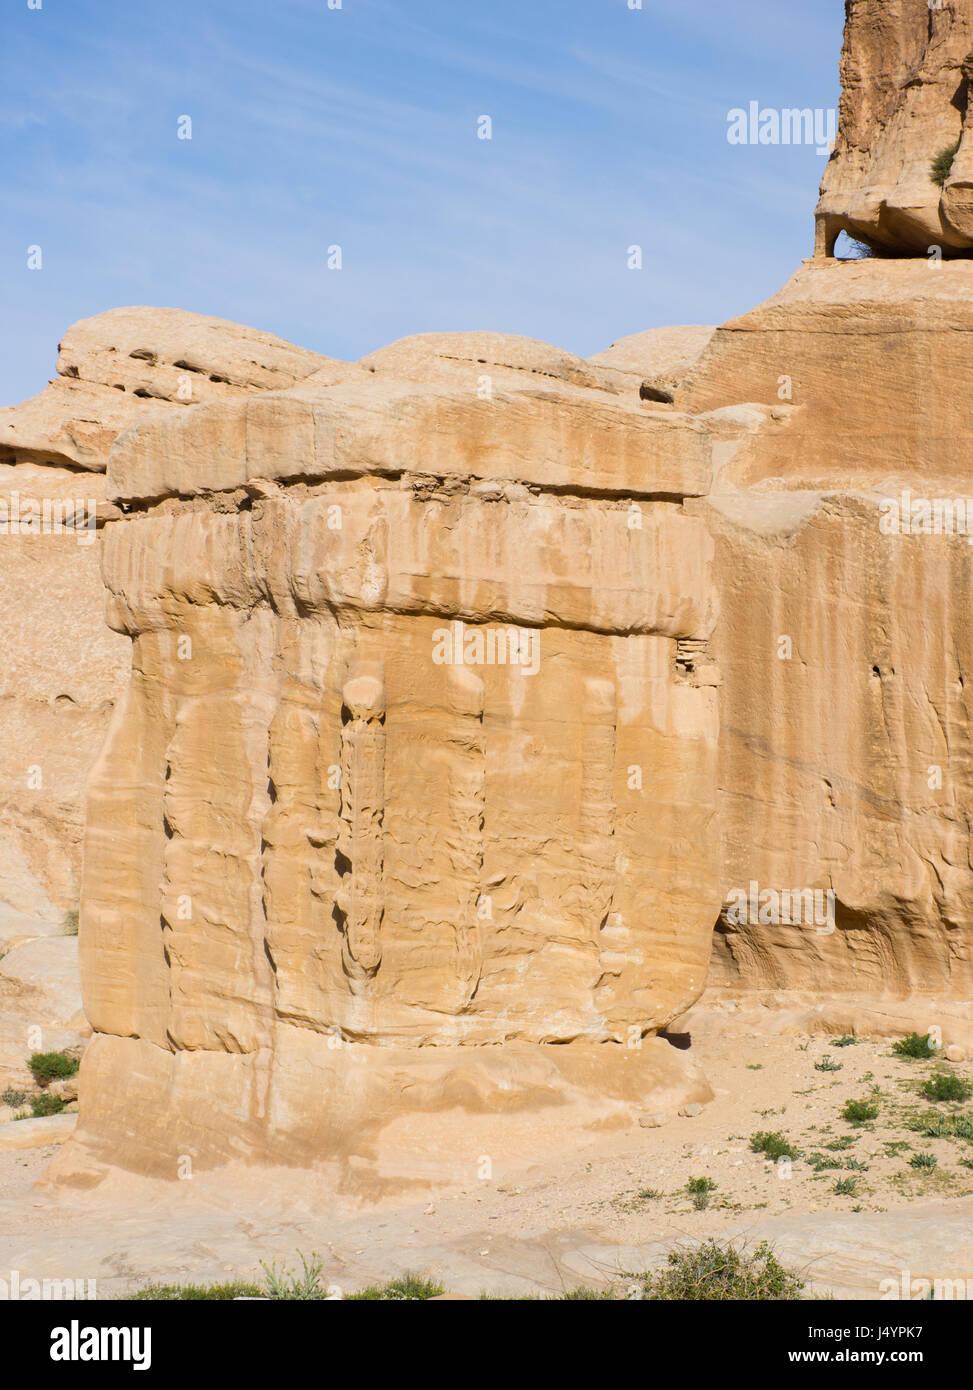 Hand carved stone Djinn blocks marking the entrance to tombs in Petra Jordan, the ancient Nabataean city of Raqmu. Stock Photo